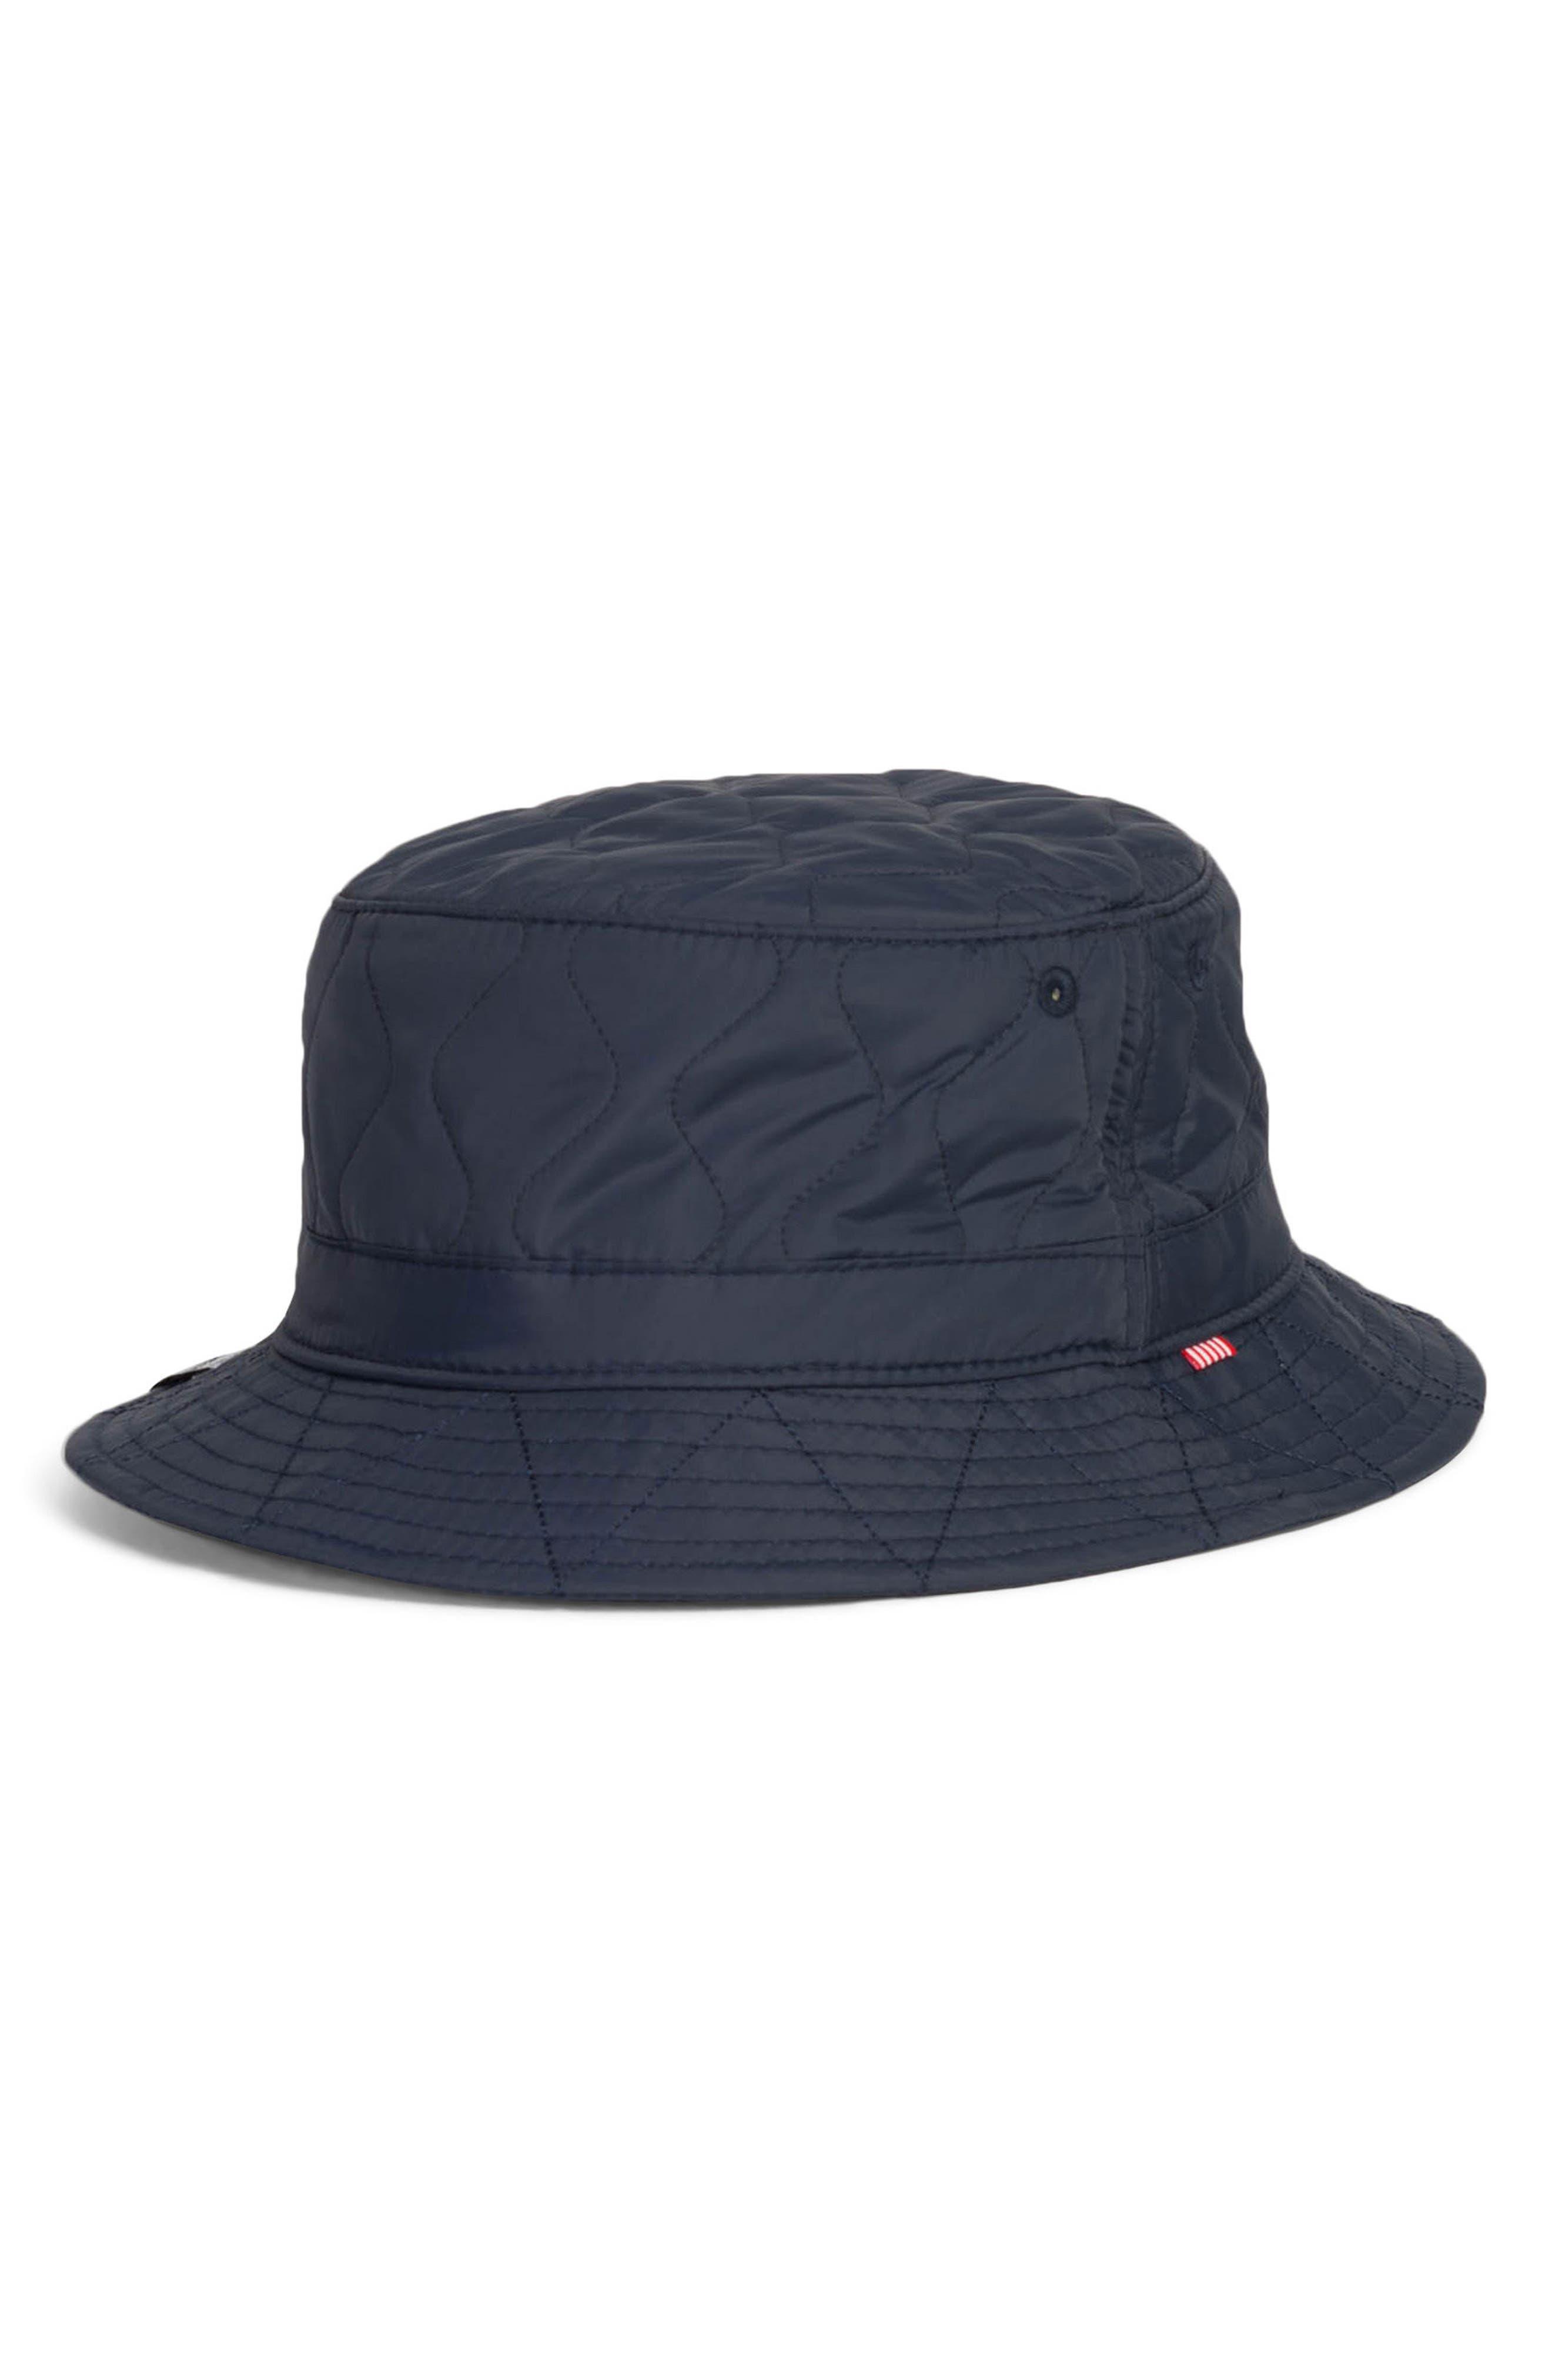 Lake Bucket Hat,                             Alternate thumbnail 4, color,